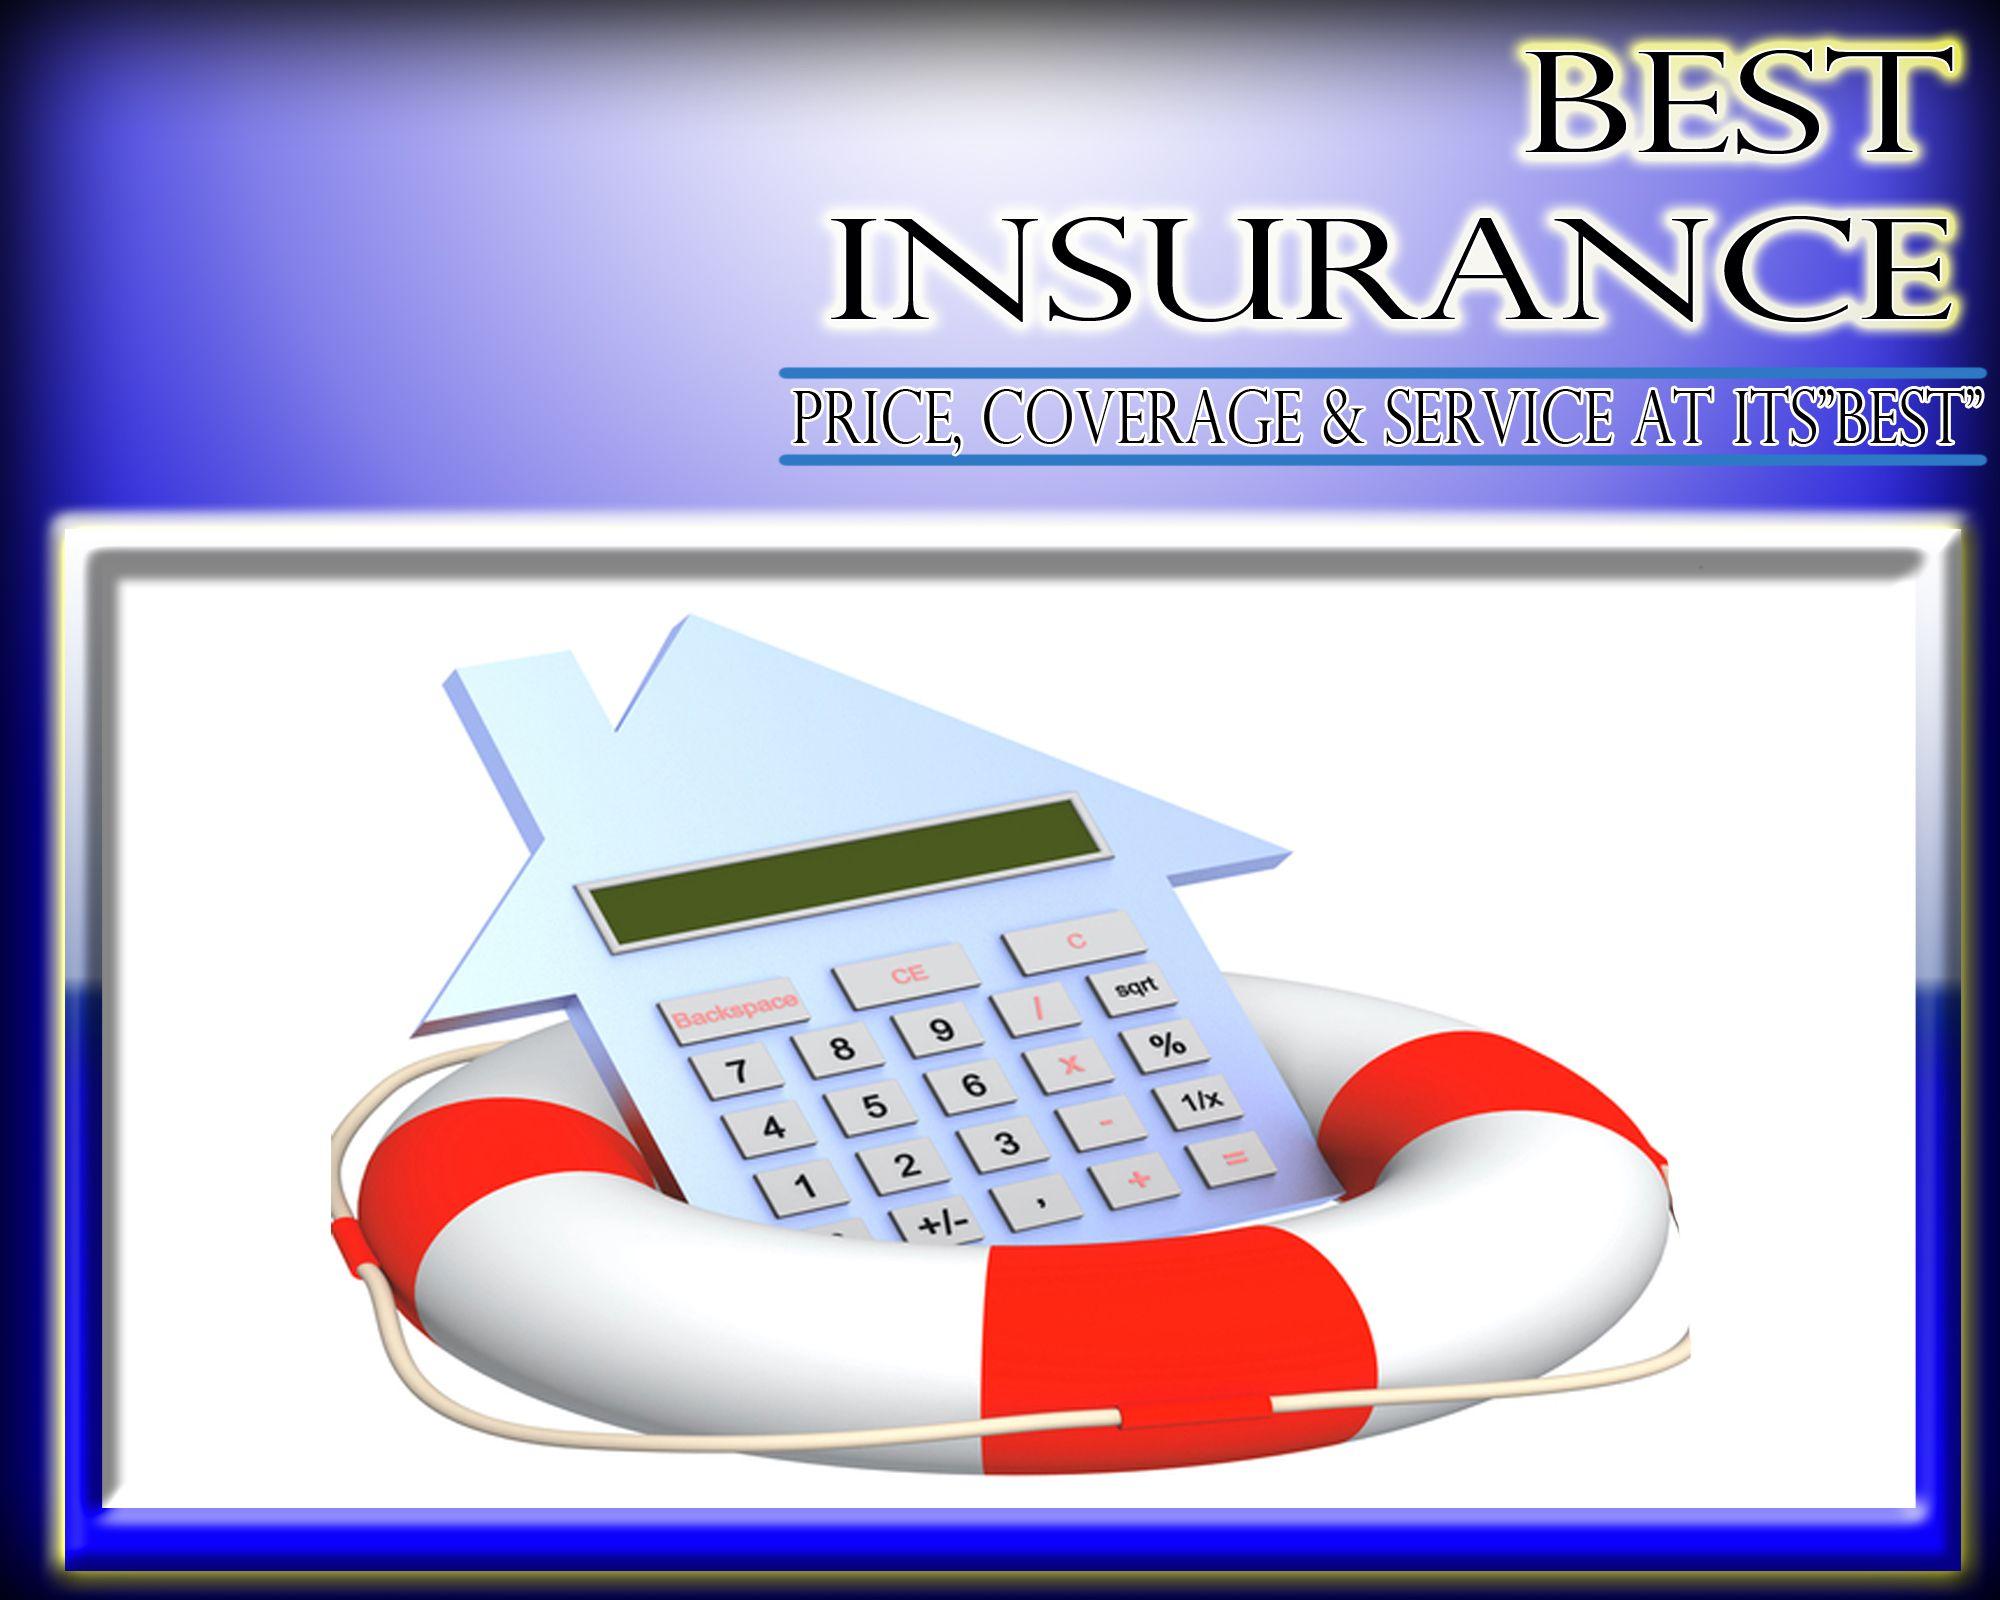 Homeownersinsurancefortlauderdale Loan Insurance Best Insurance